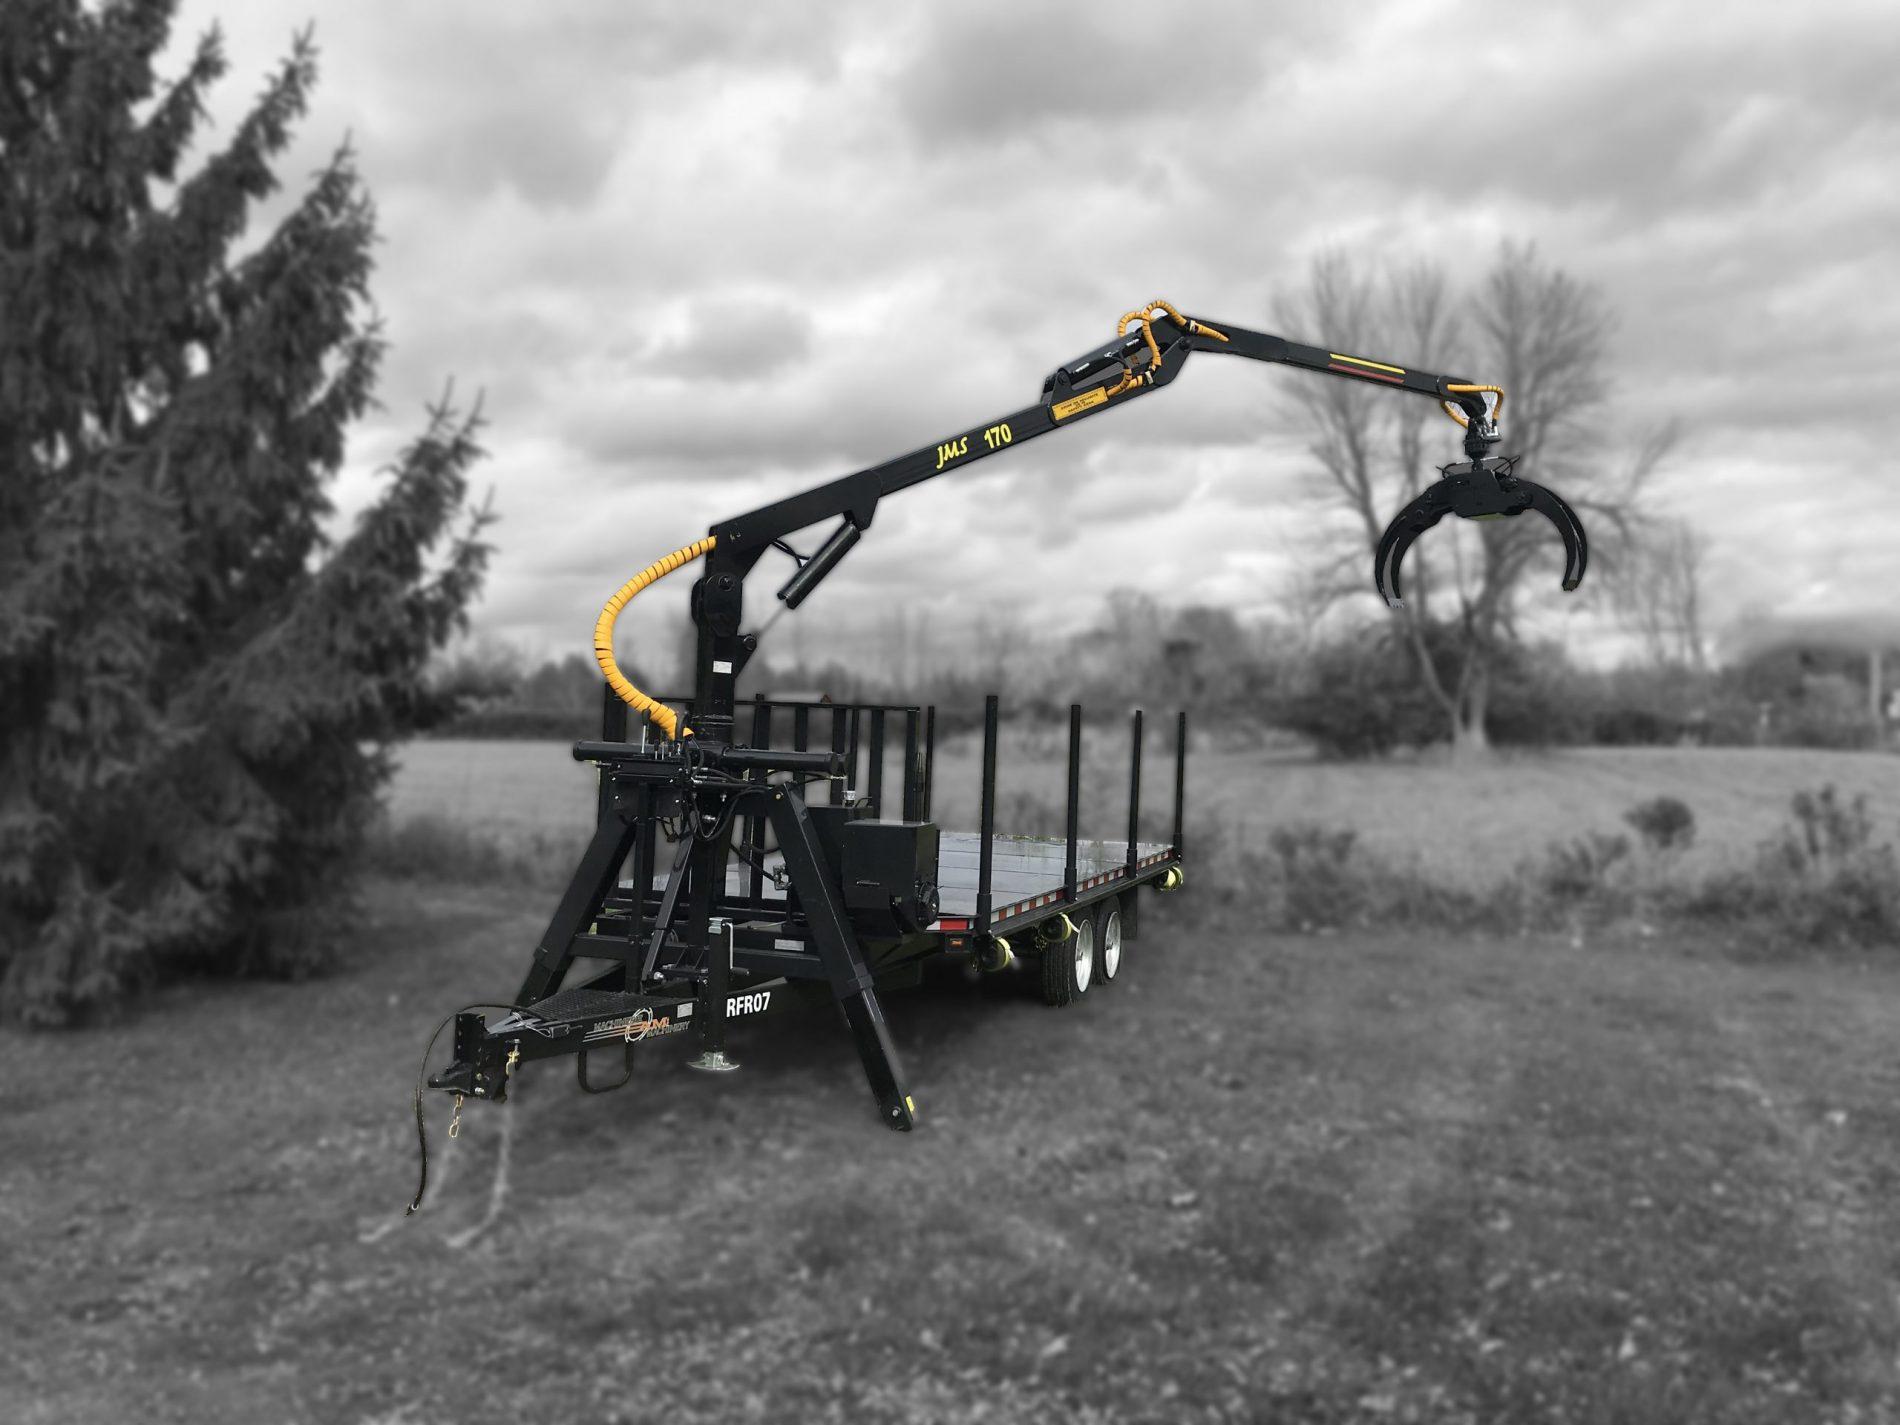 jms 170 log loader and Trailer model rfr07